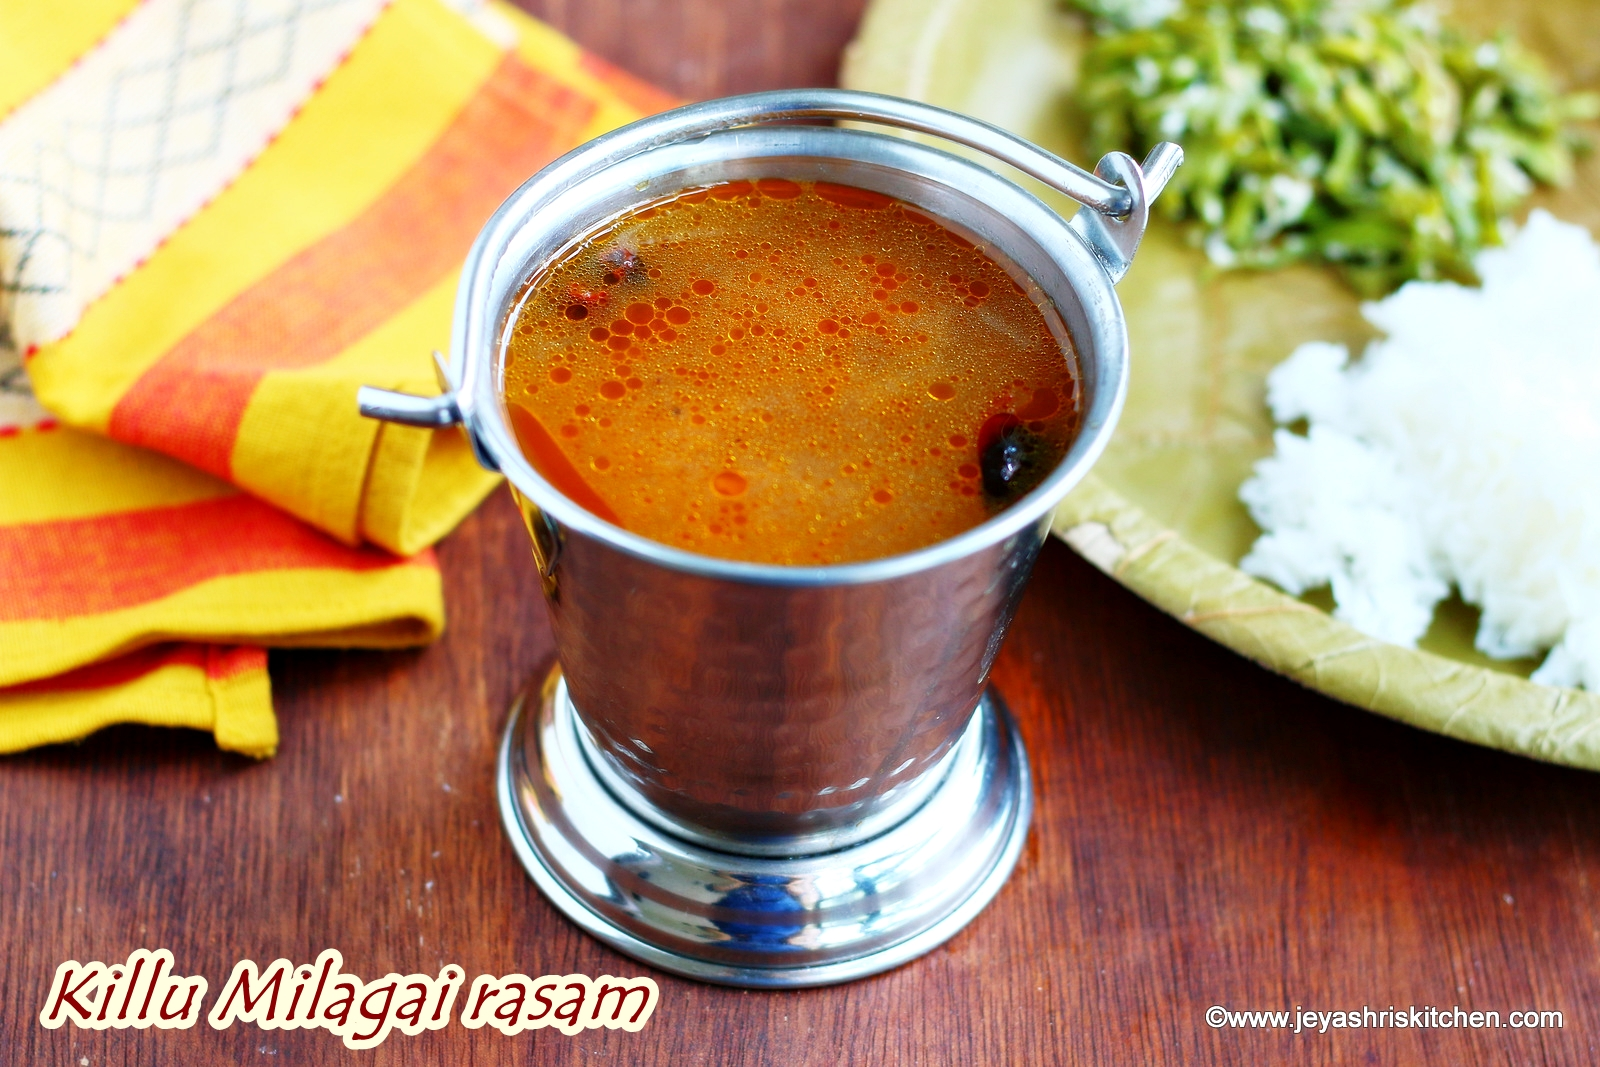 Jeyashri's Kitchen - A Vegetarian Food Blog with detailed